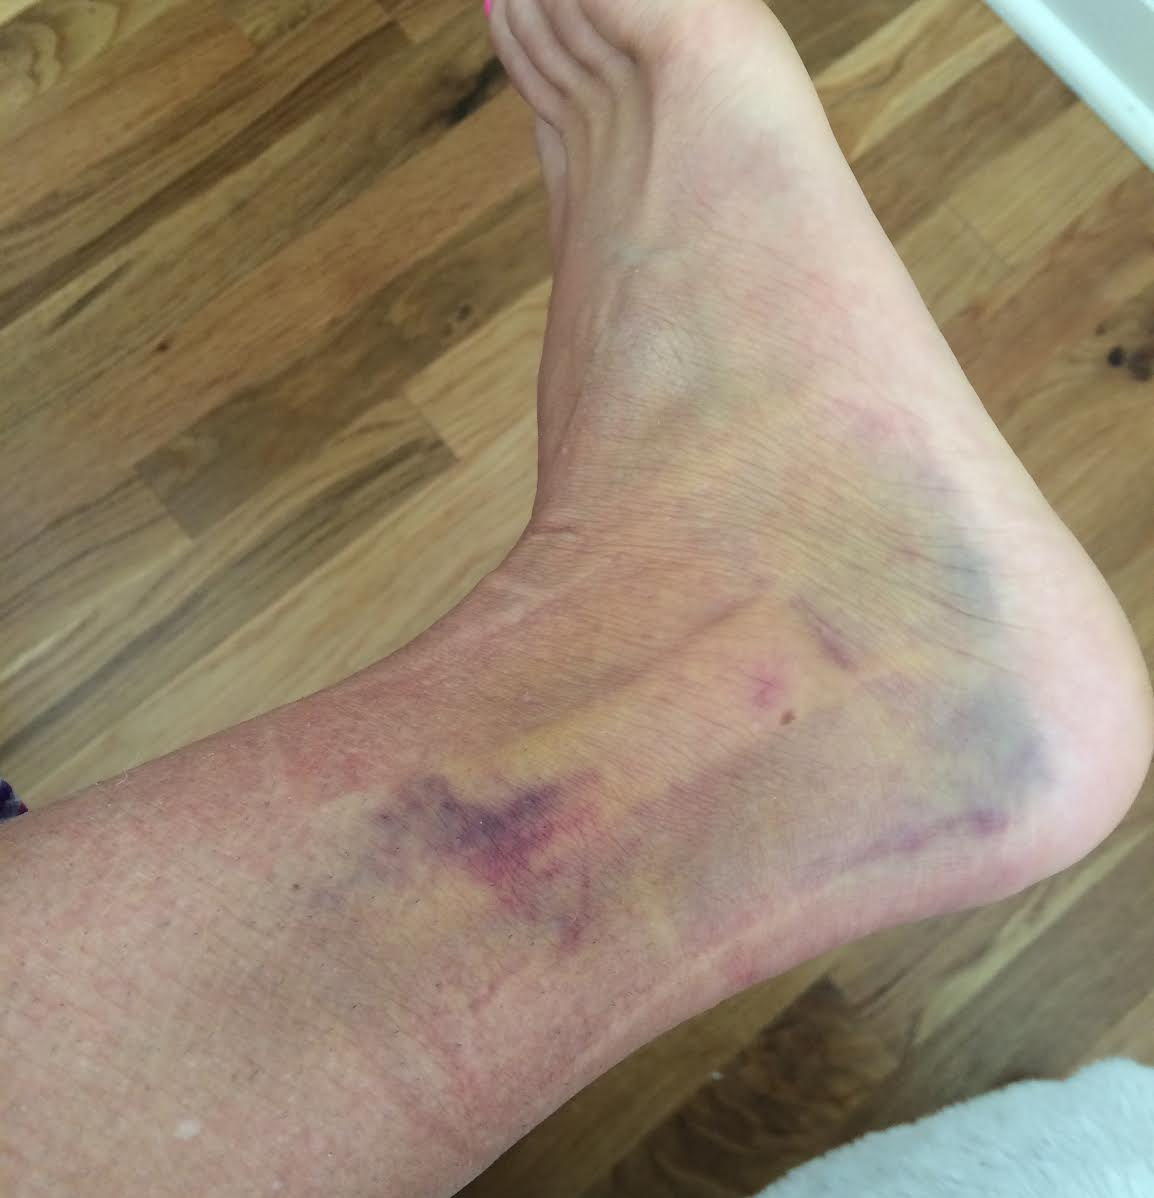 A few days after the sprain